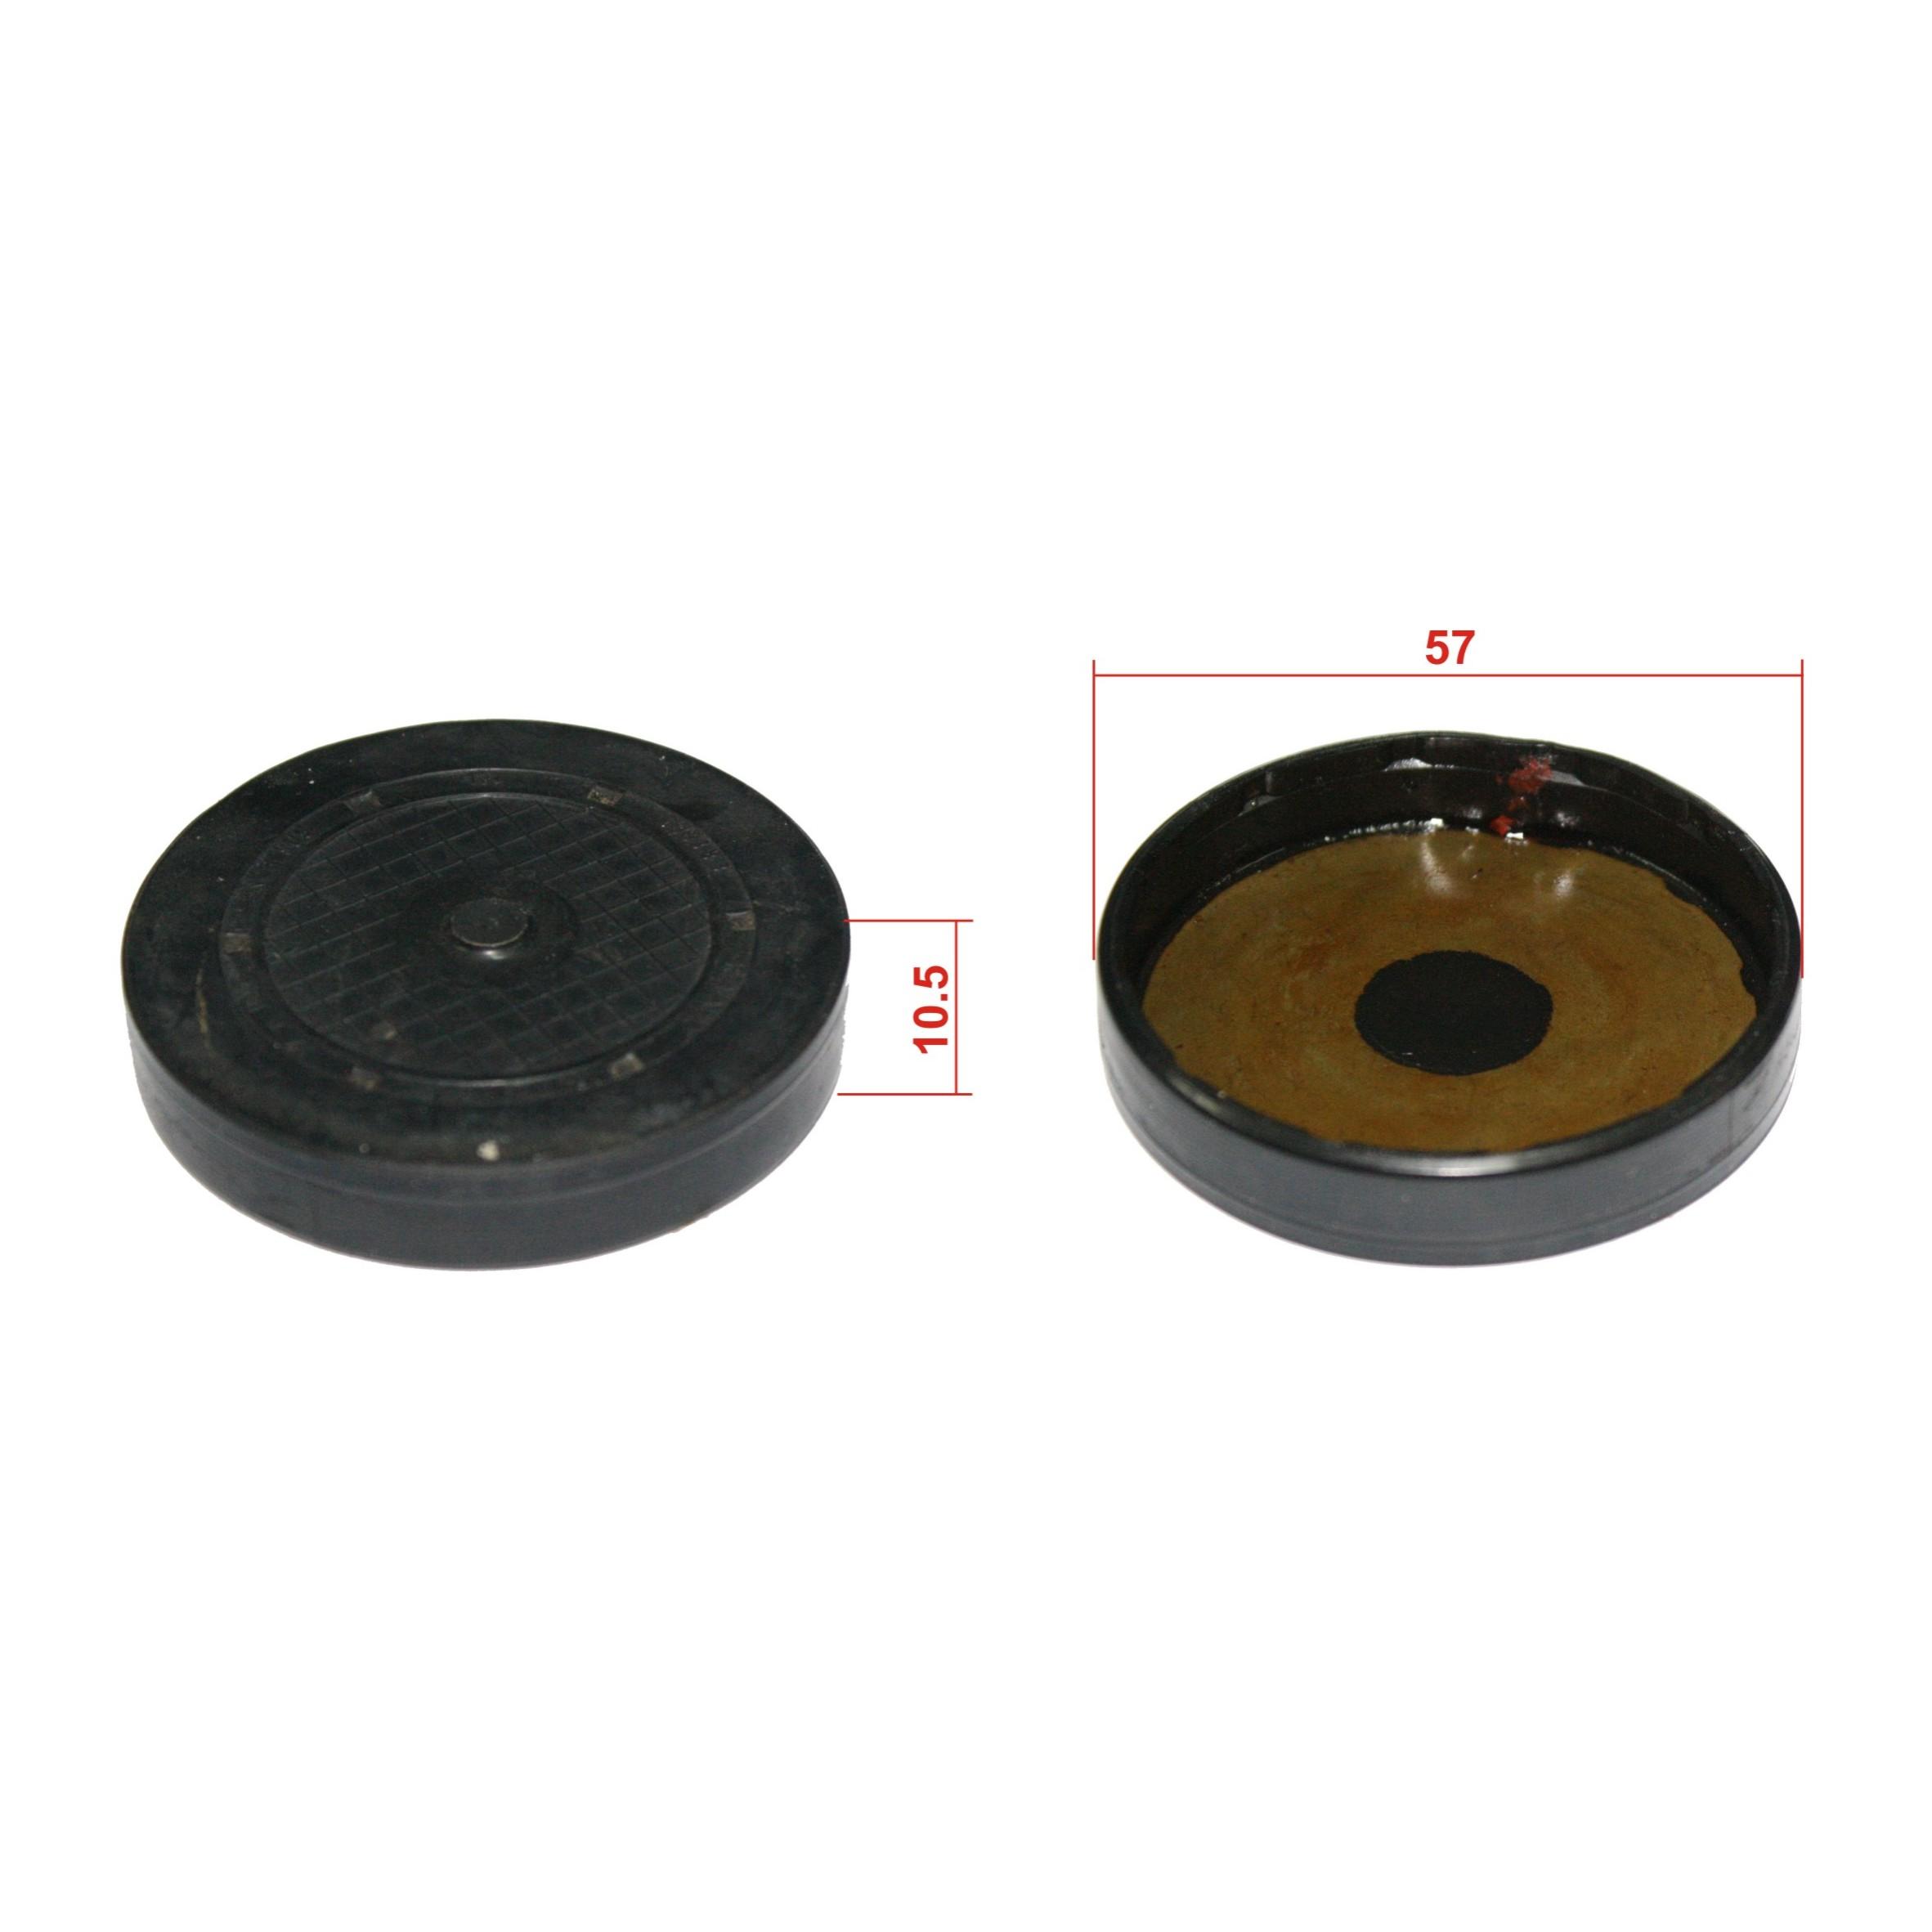 Ret a levas tapon grande ren 1.6l16v k4m 57x10.5mm